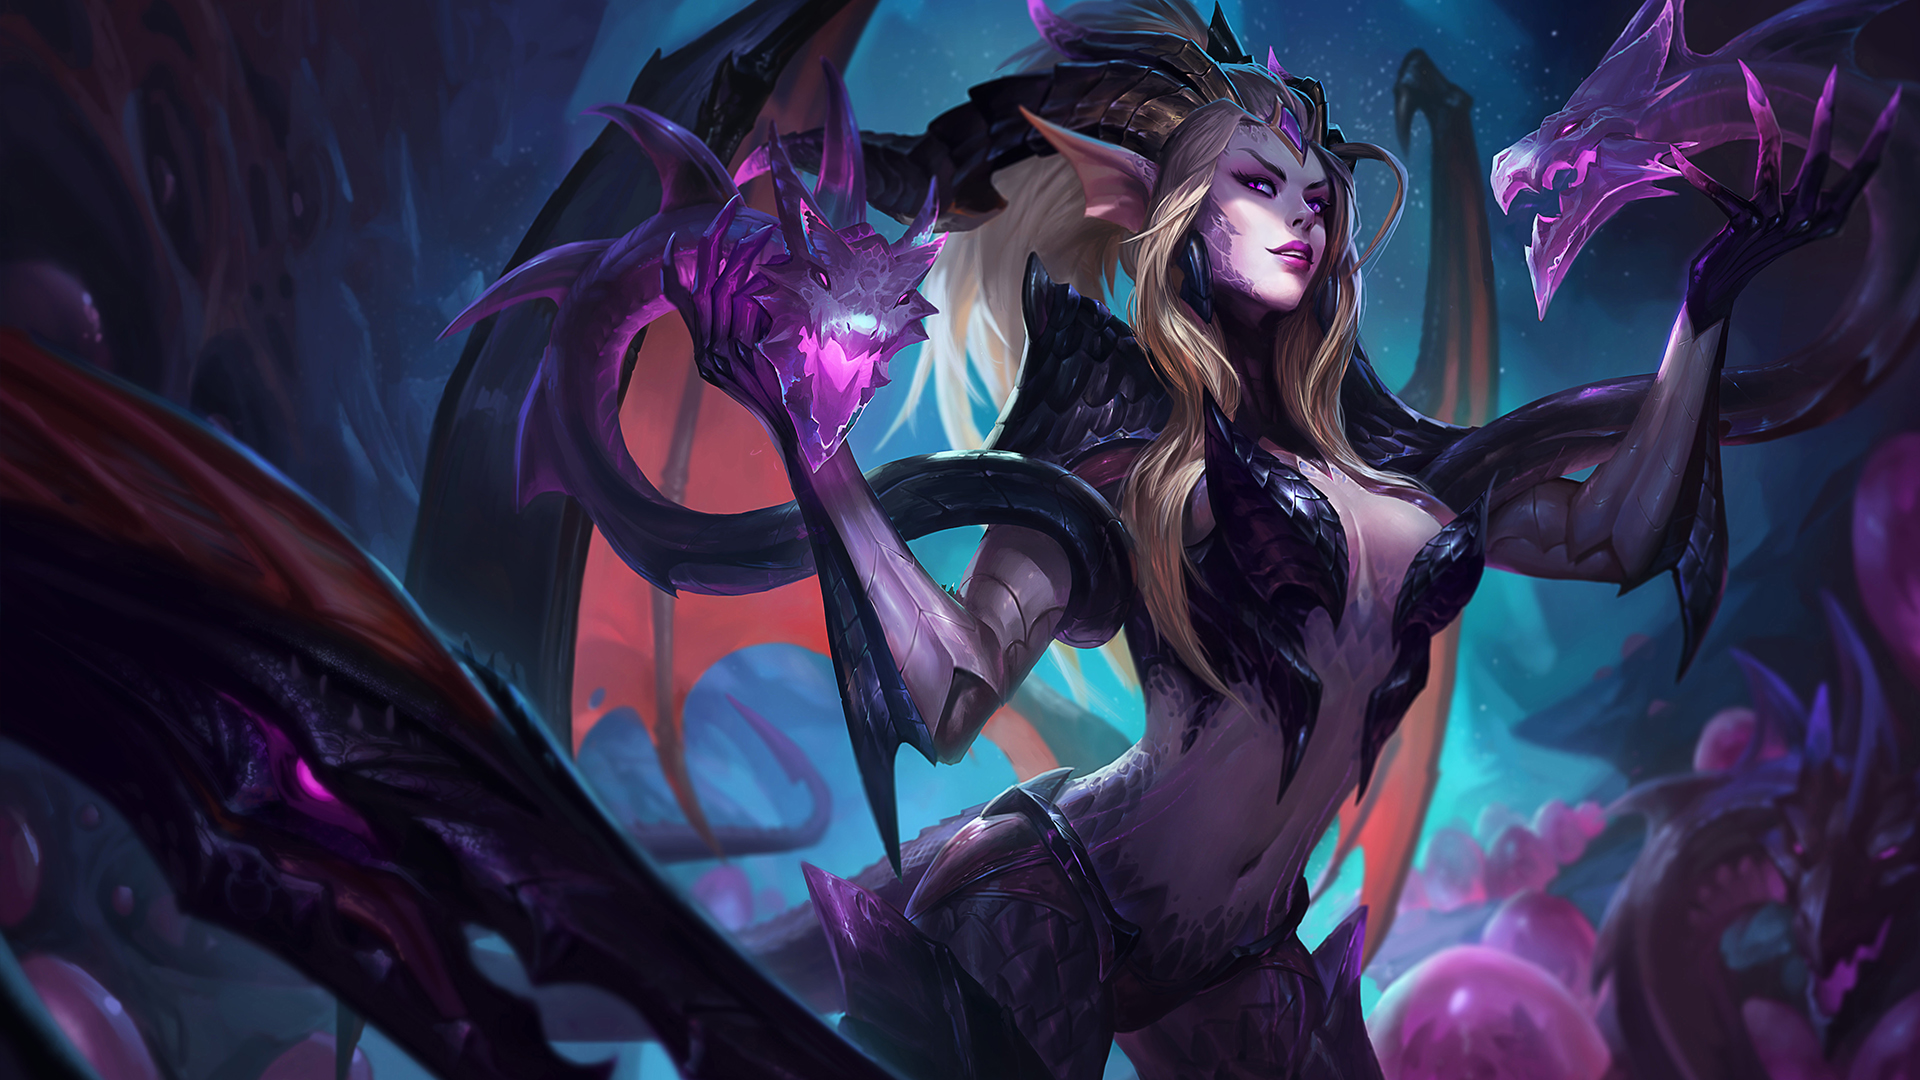 /dev: On Sound Design for the Dragon Sorceress – Nexus